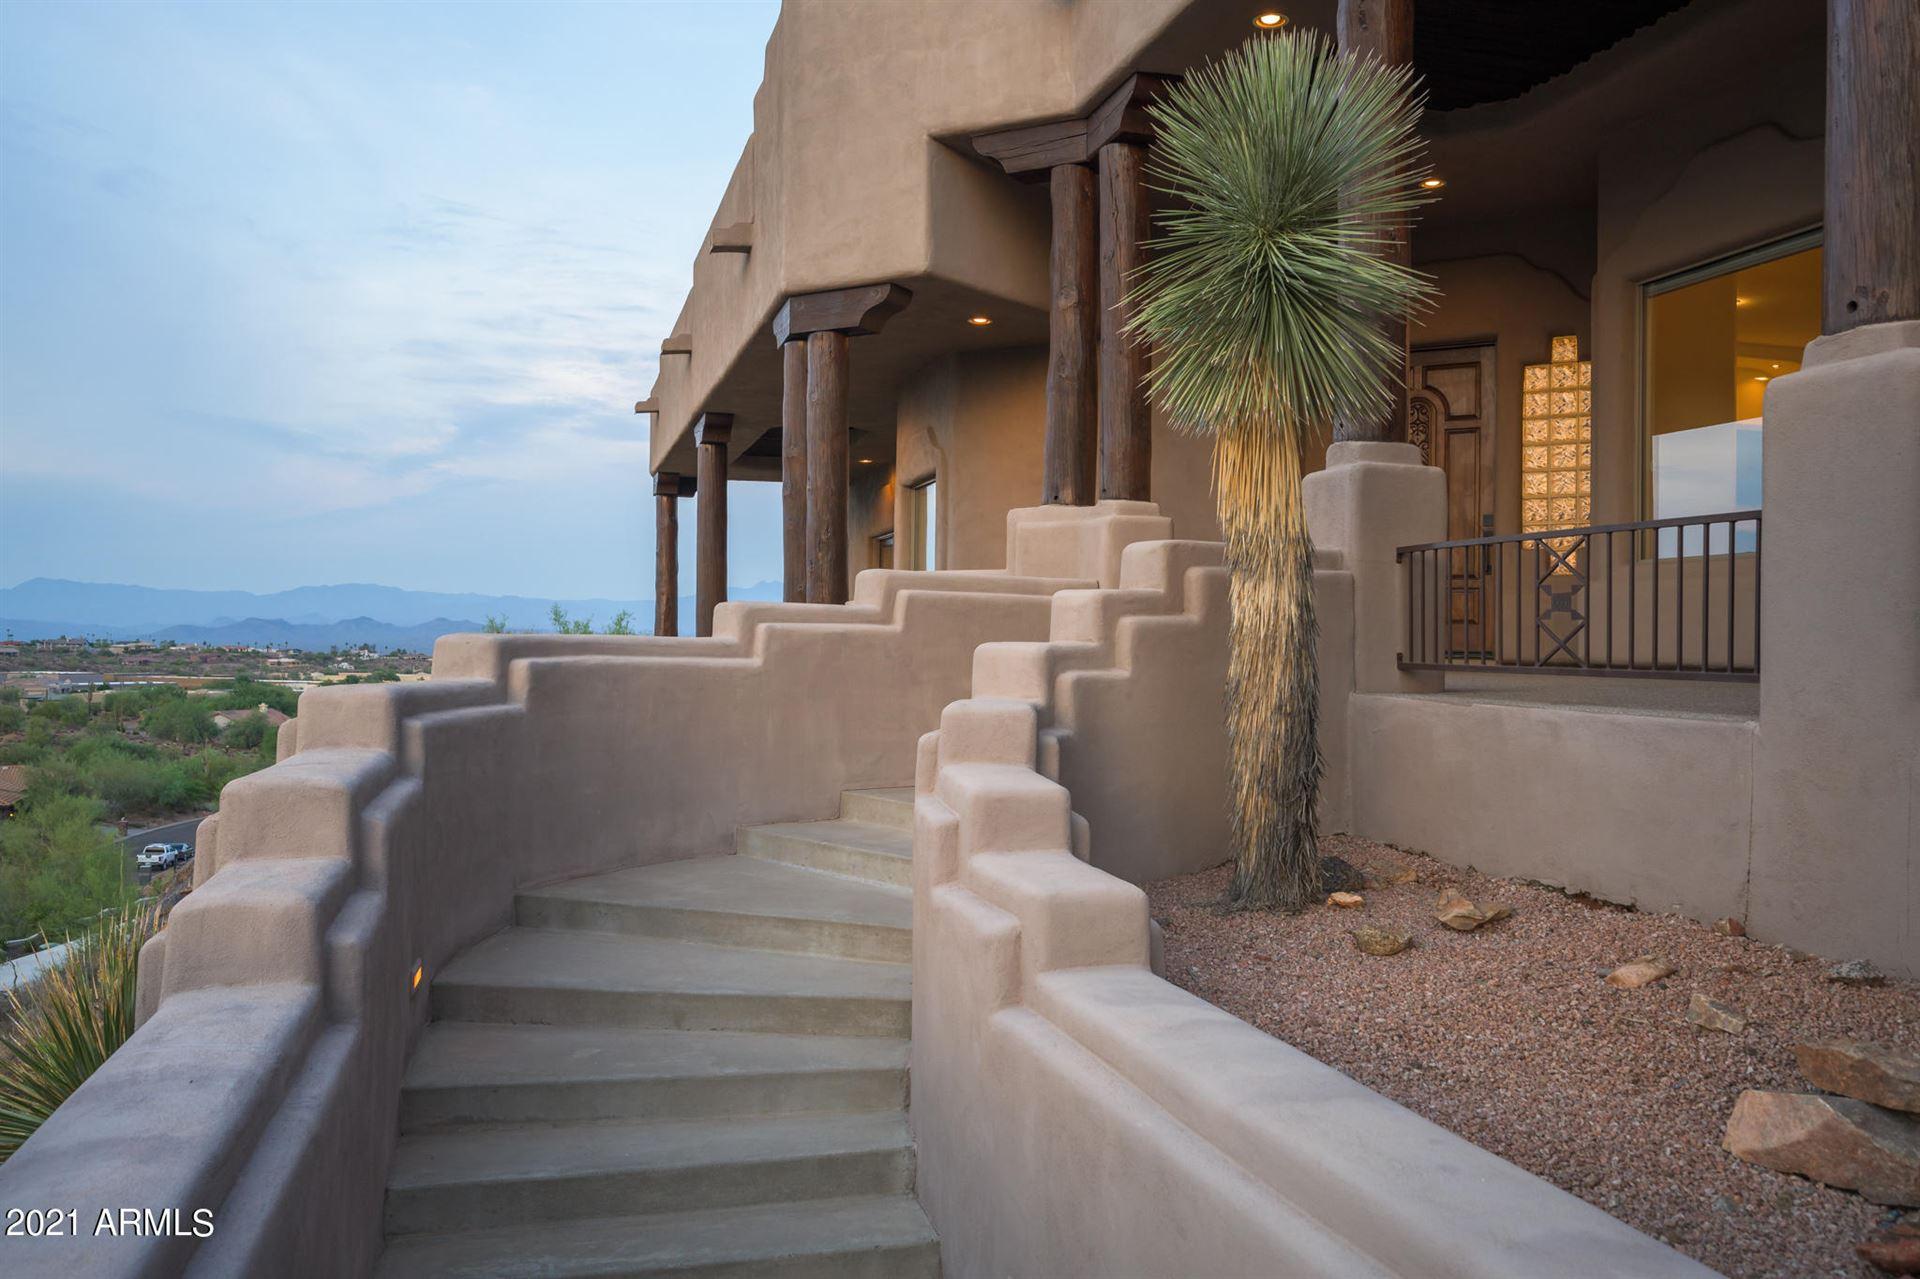 Photo of 16259 E POWDERHORN Drive, Fountain Hills, AZ 85268 (MLS # 6265683)